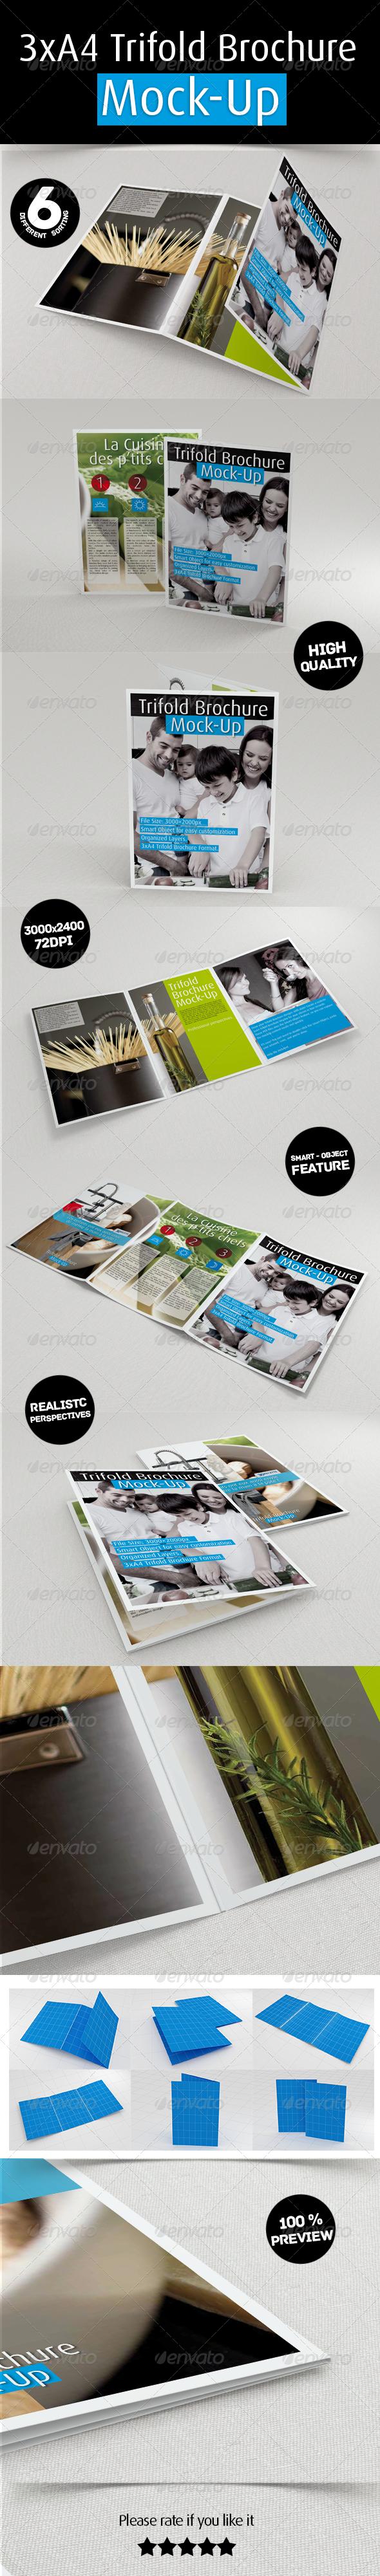 GraphicRiver 3xA4 Trifold Brochure Mockup 6837257